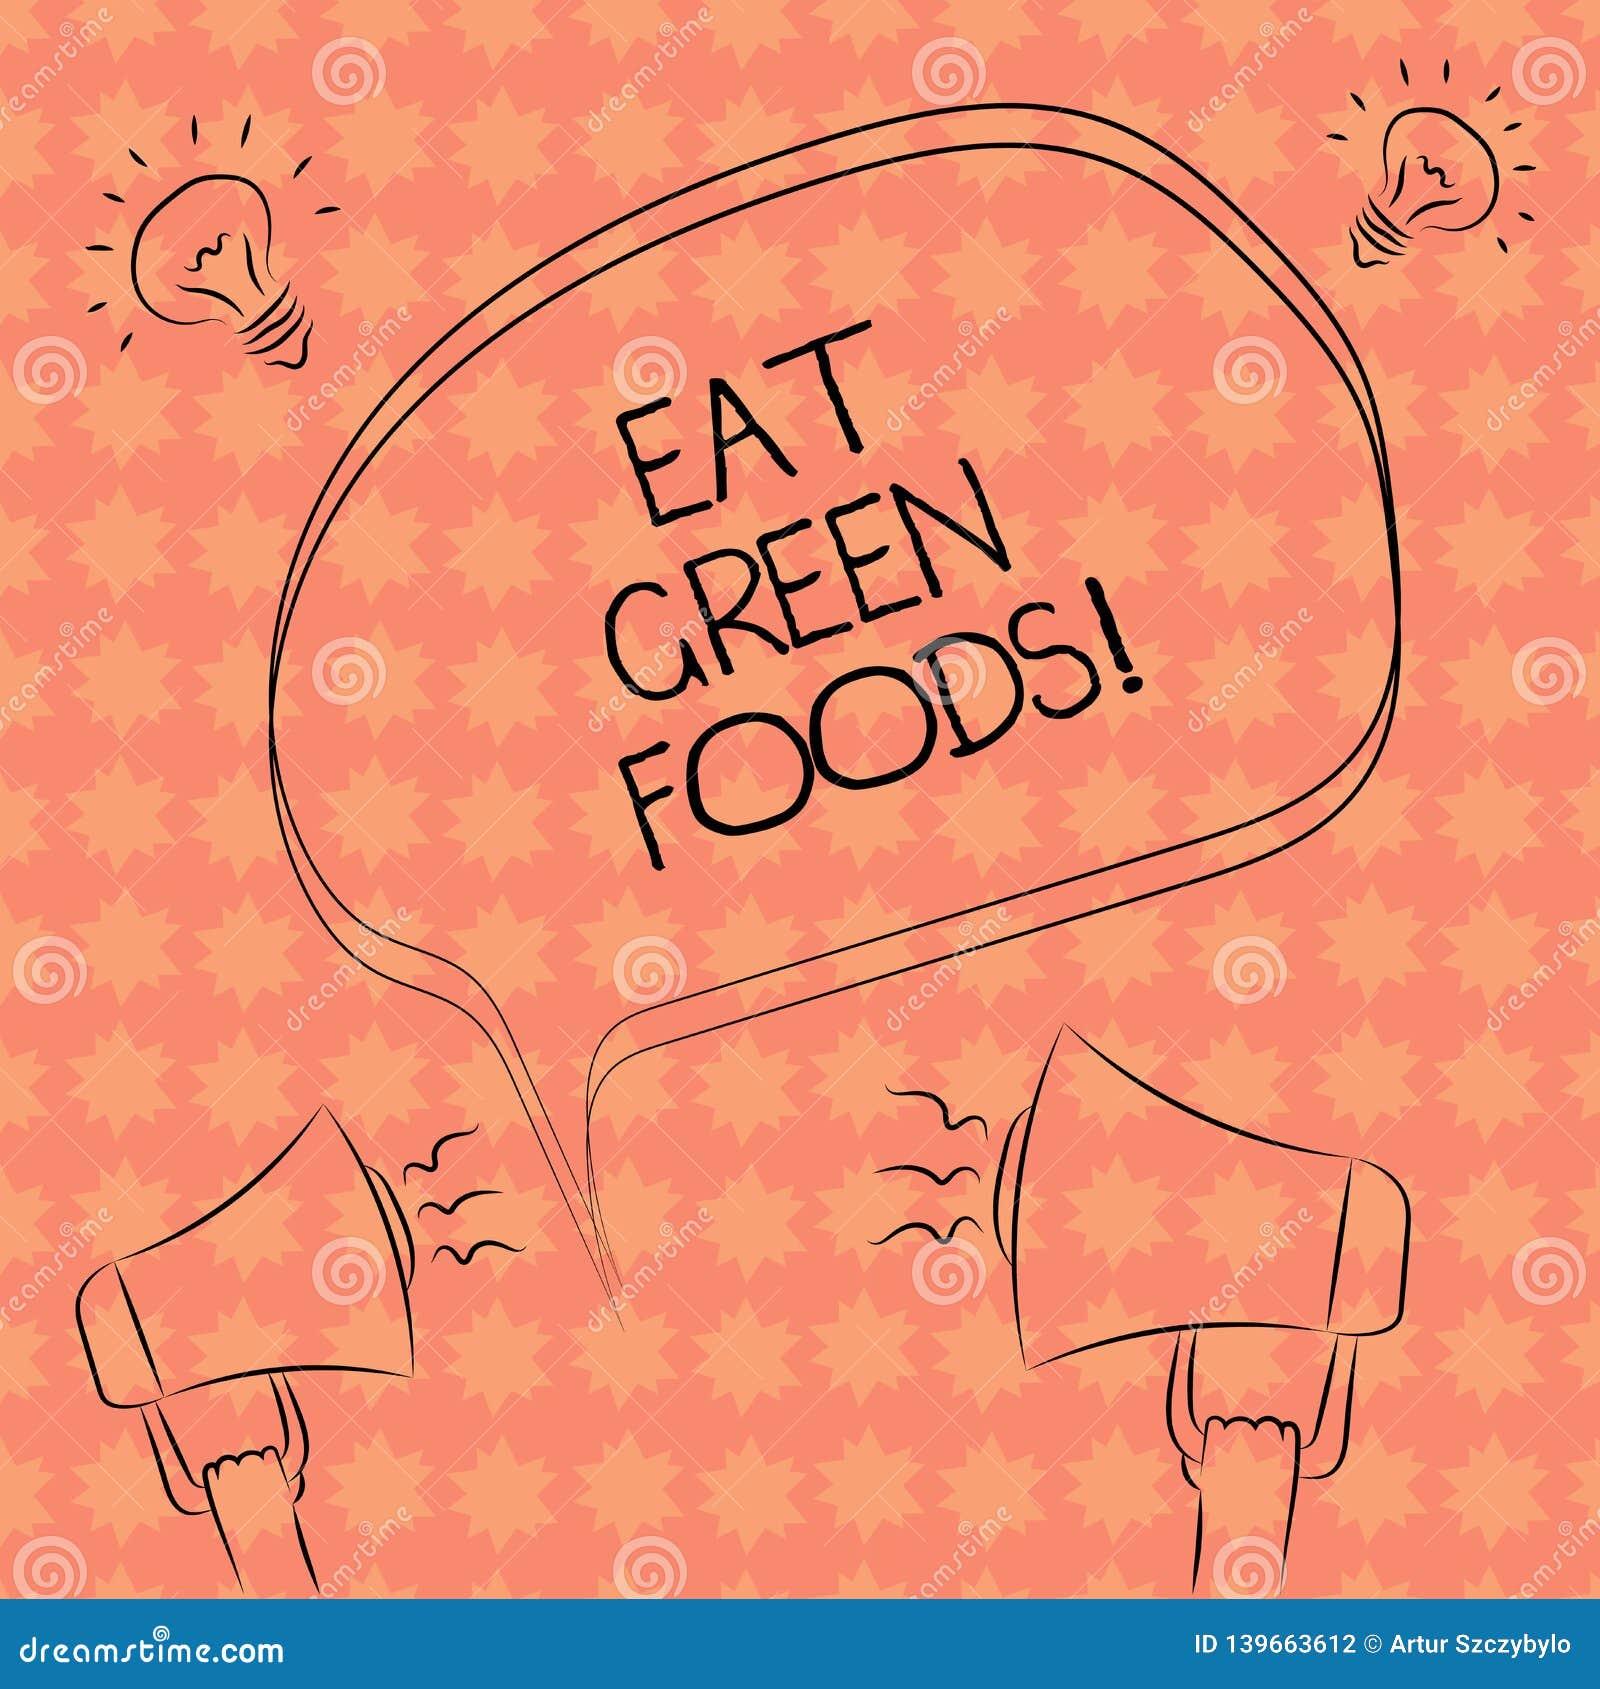 Writing note showing Eat Green Foods. Business photo showcasing Eating more vegetables healthy diet vegetarian veggie